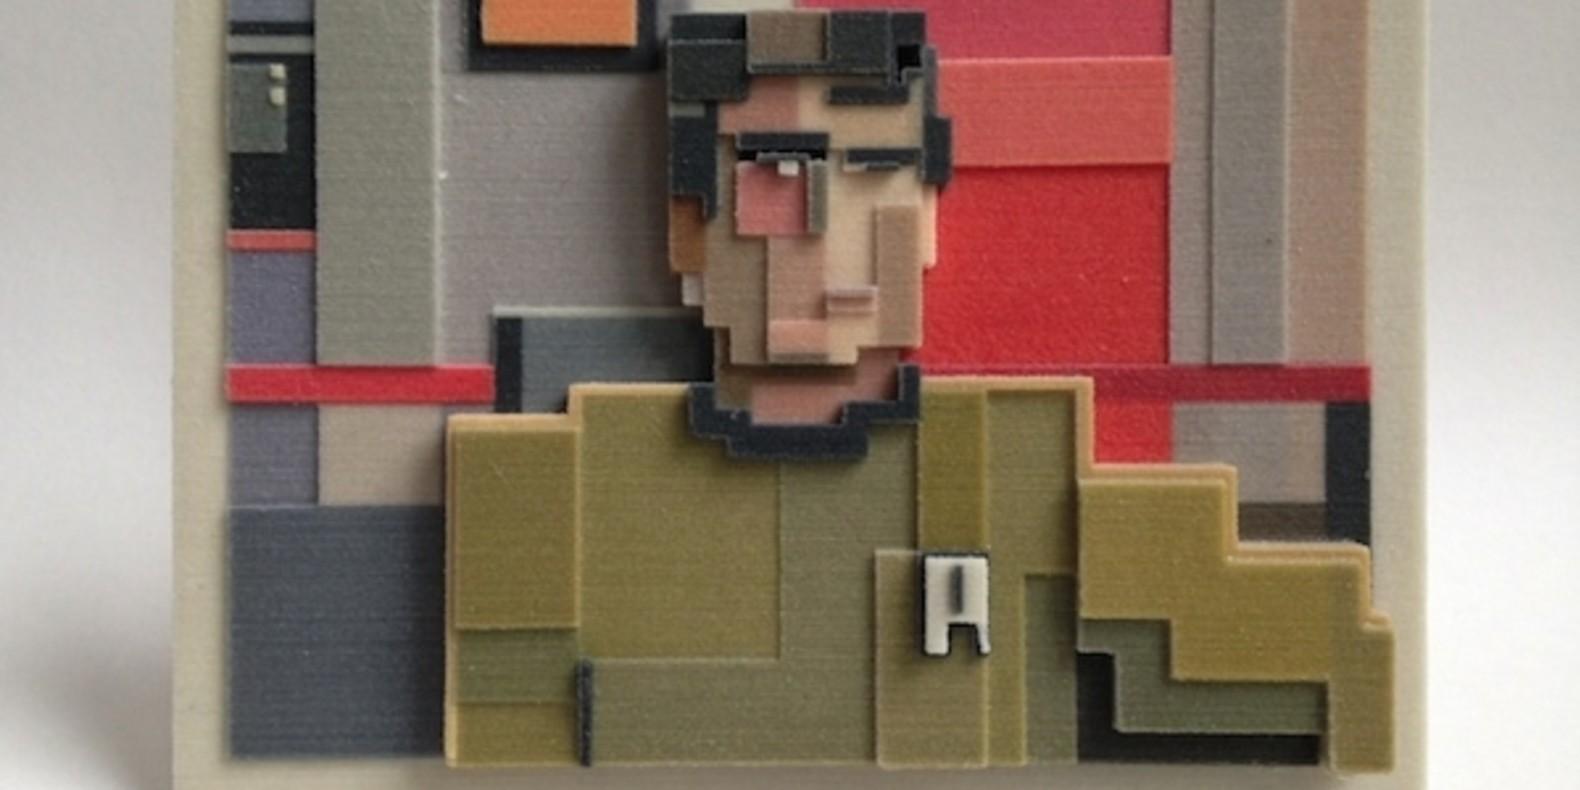 adam lister isaac budmen 8 Bits, 3 Dimensions art 3D printing printed cults3D fichier 3D designer artist ETR breaking bad superman mona lisa3